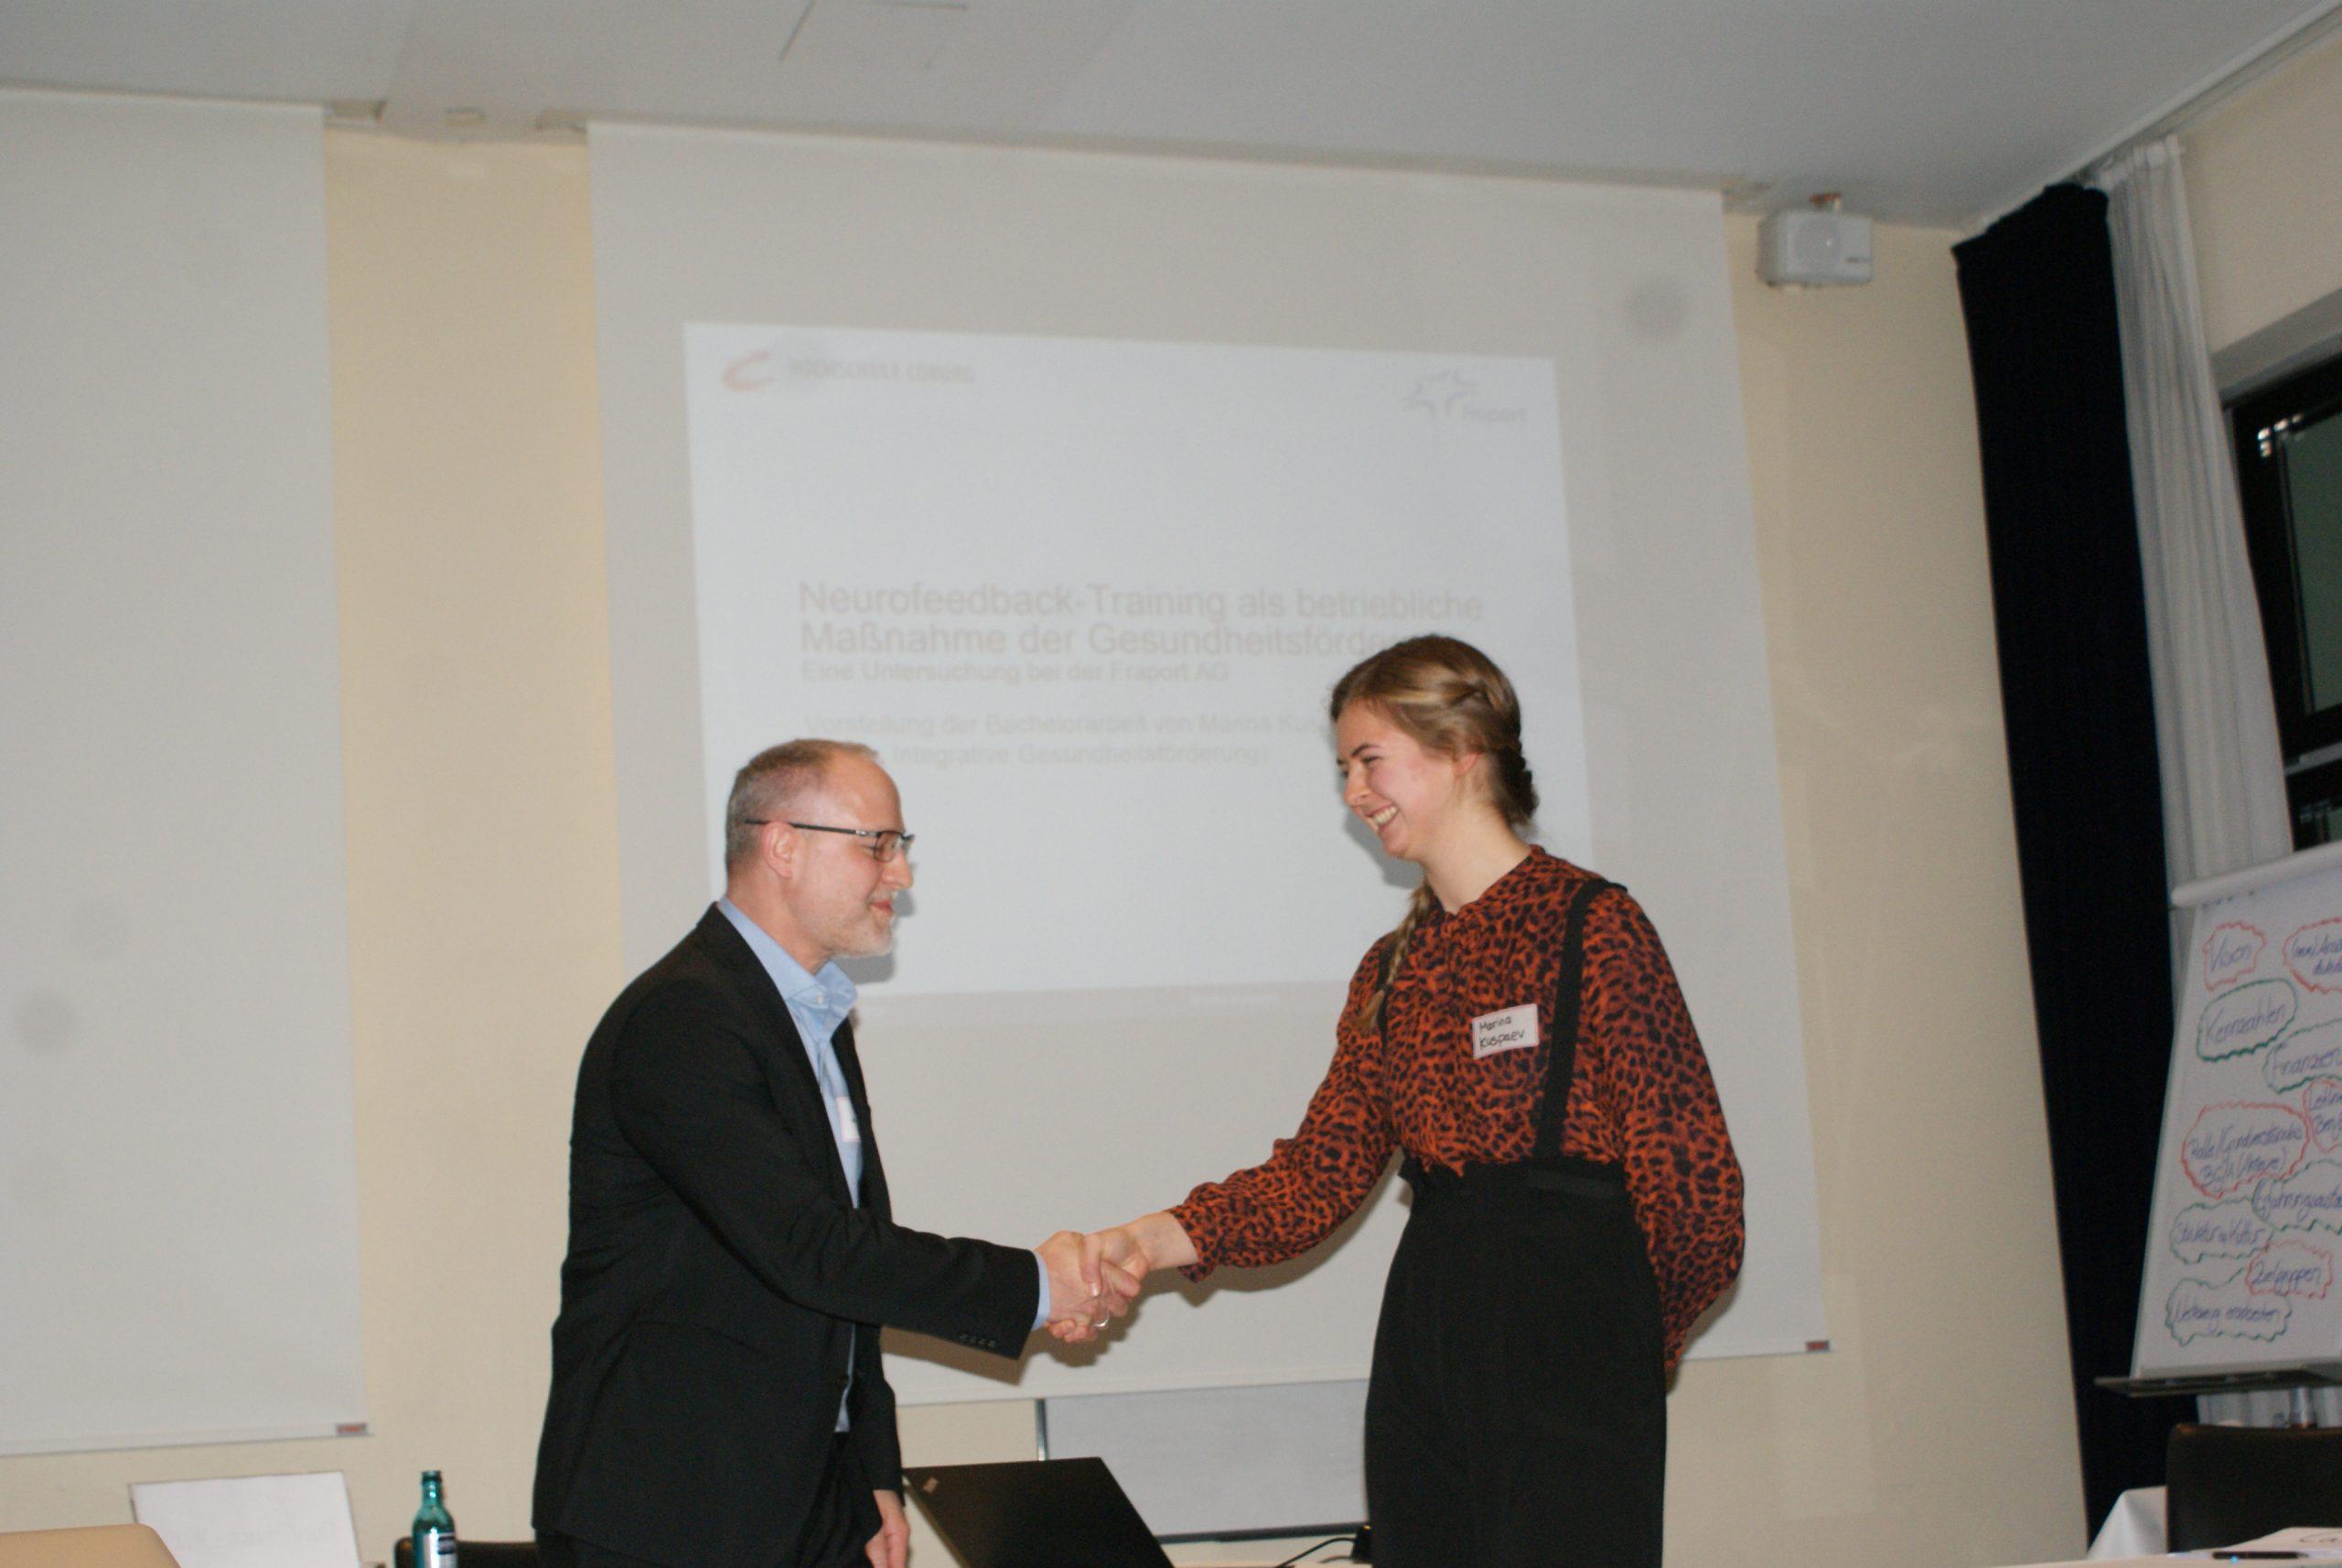 Verleihung des Nachwuchsinnovationspreises 2019